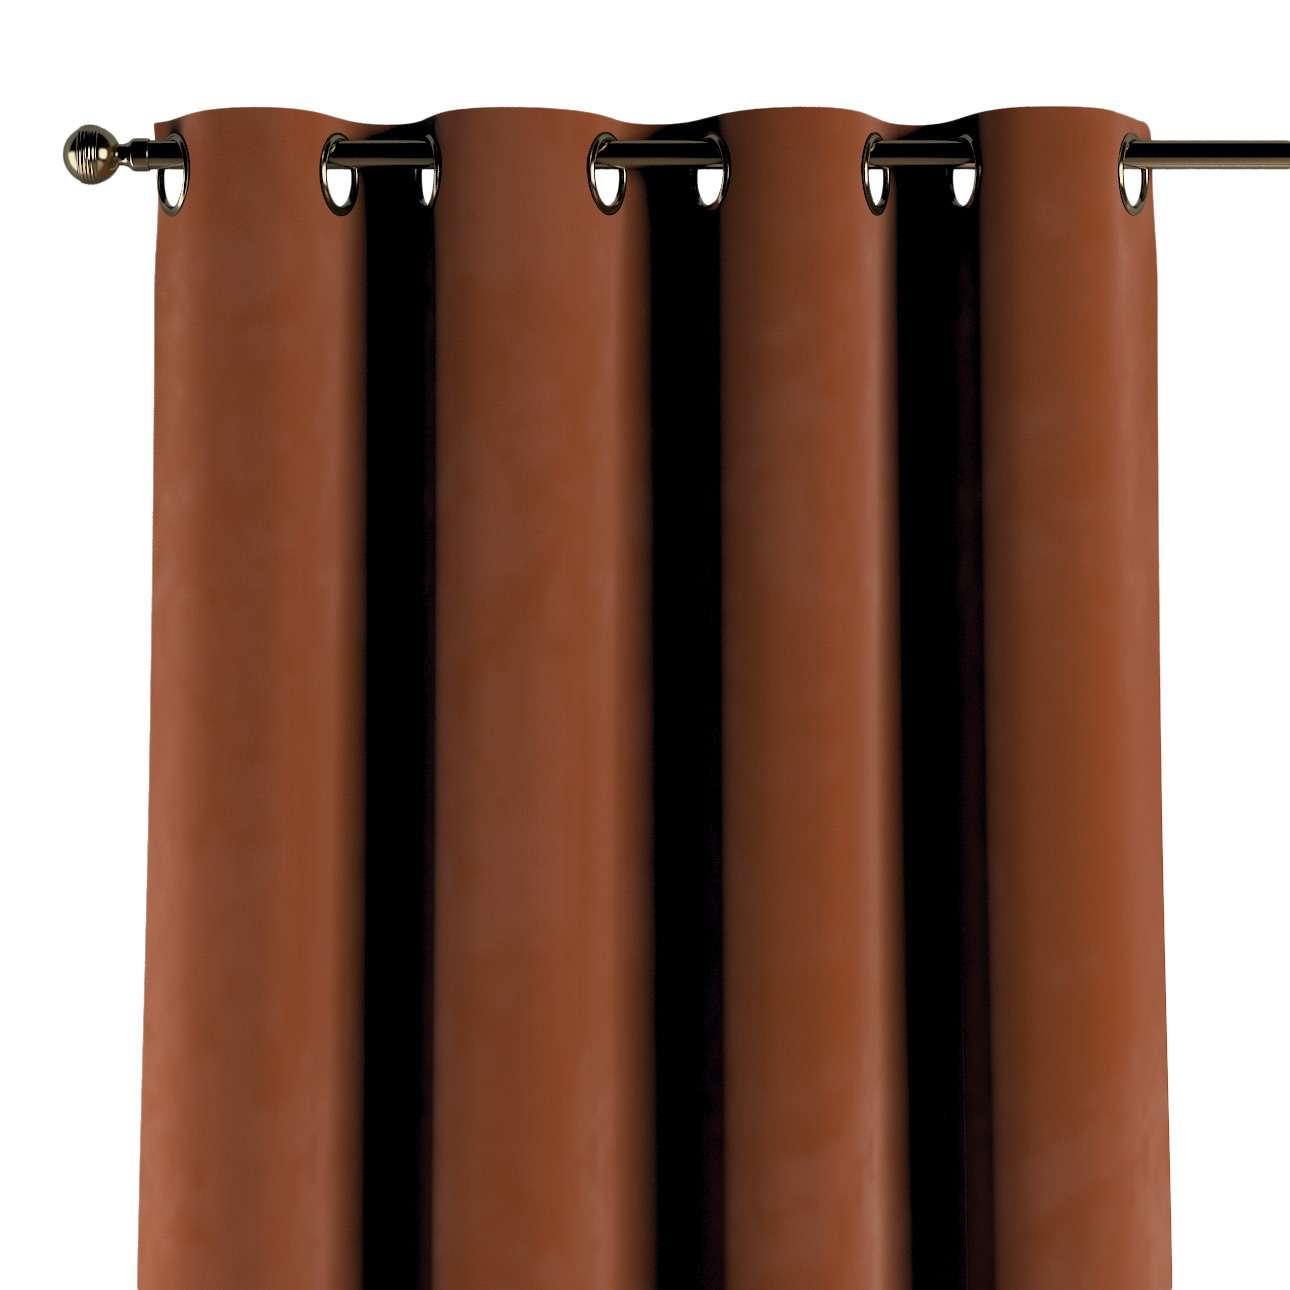 Zasłona na kółkach 1 szt. w kolekcji Velvet, tkanina: 704-33